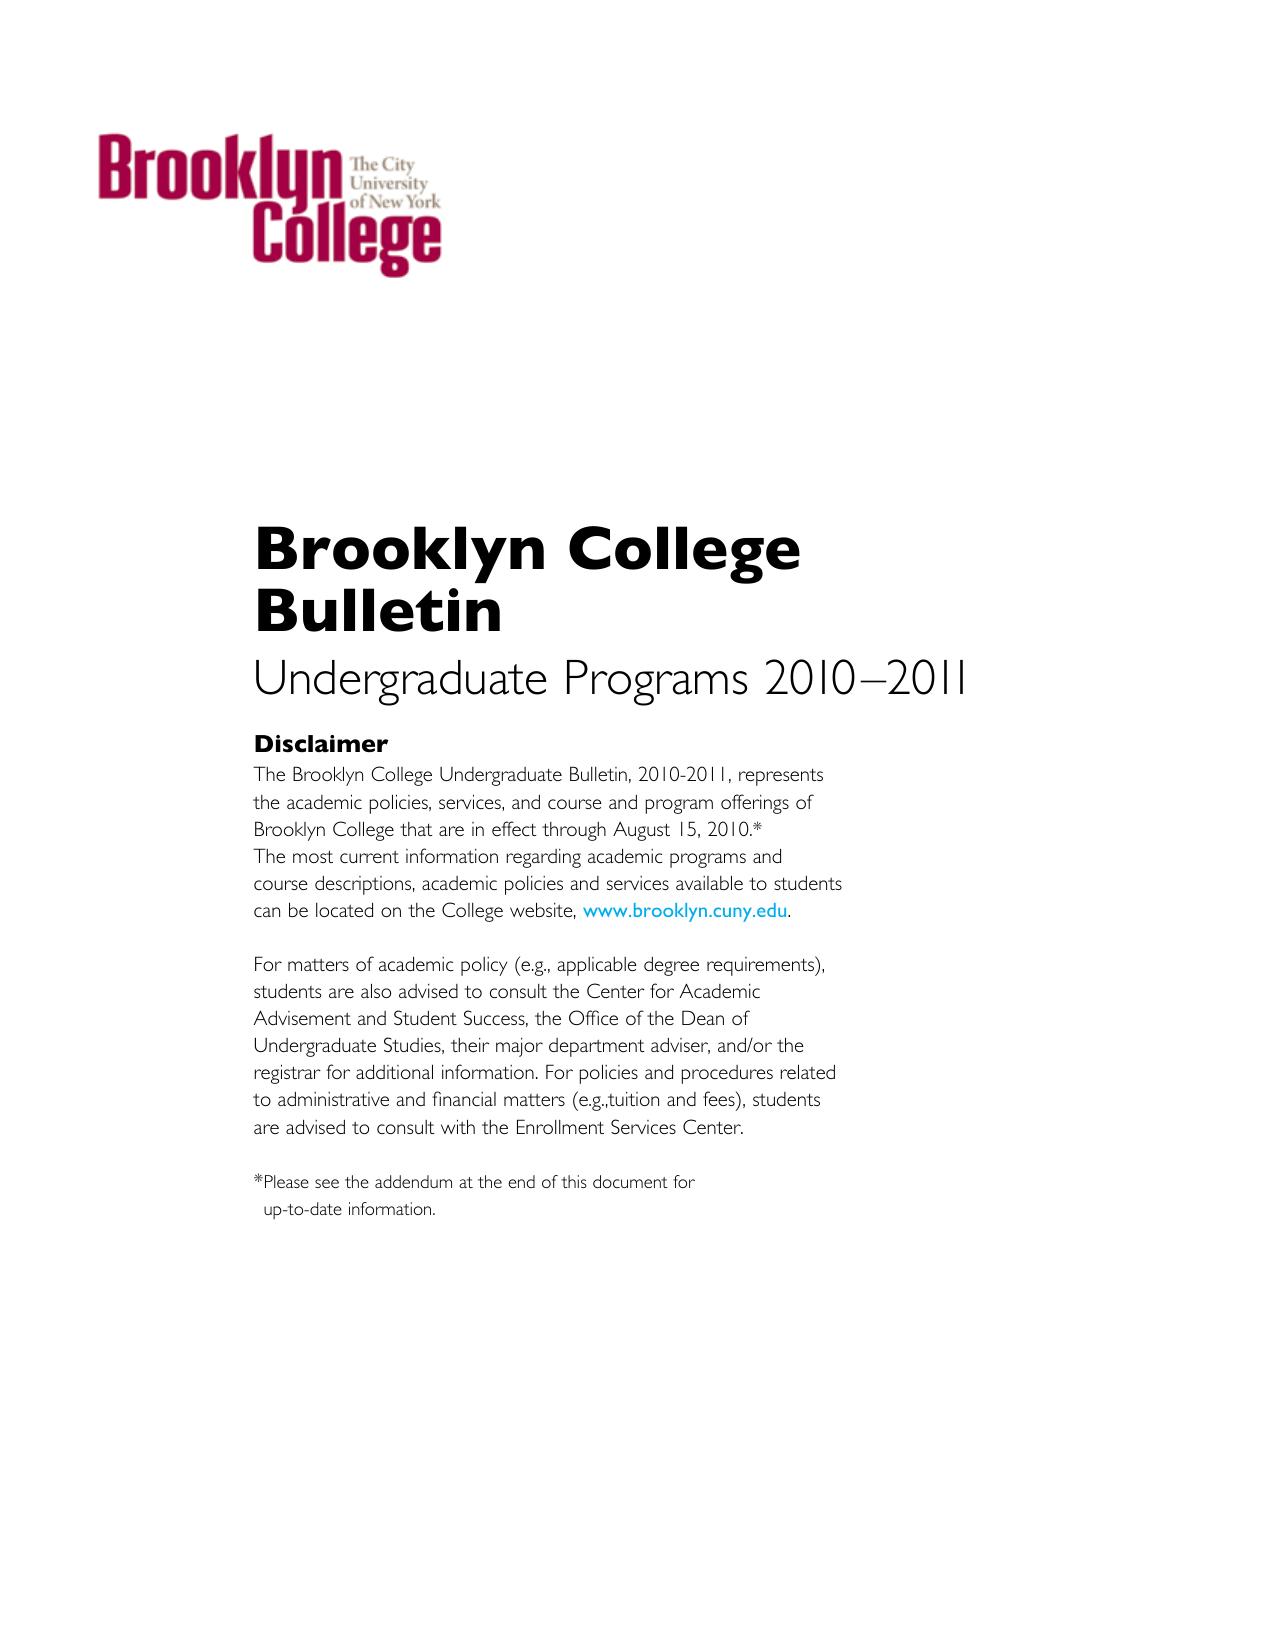 Undergraduate Bulletin 2010–2011 - Brooklyn College